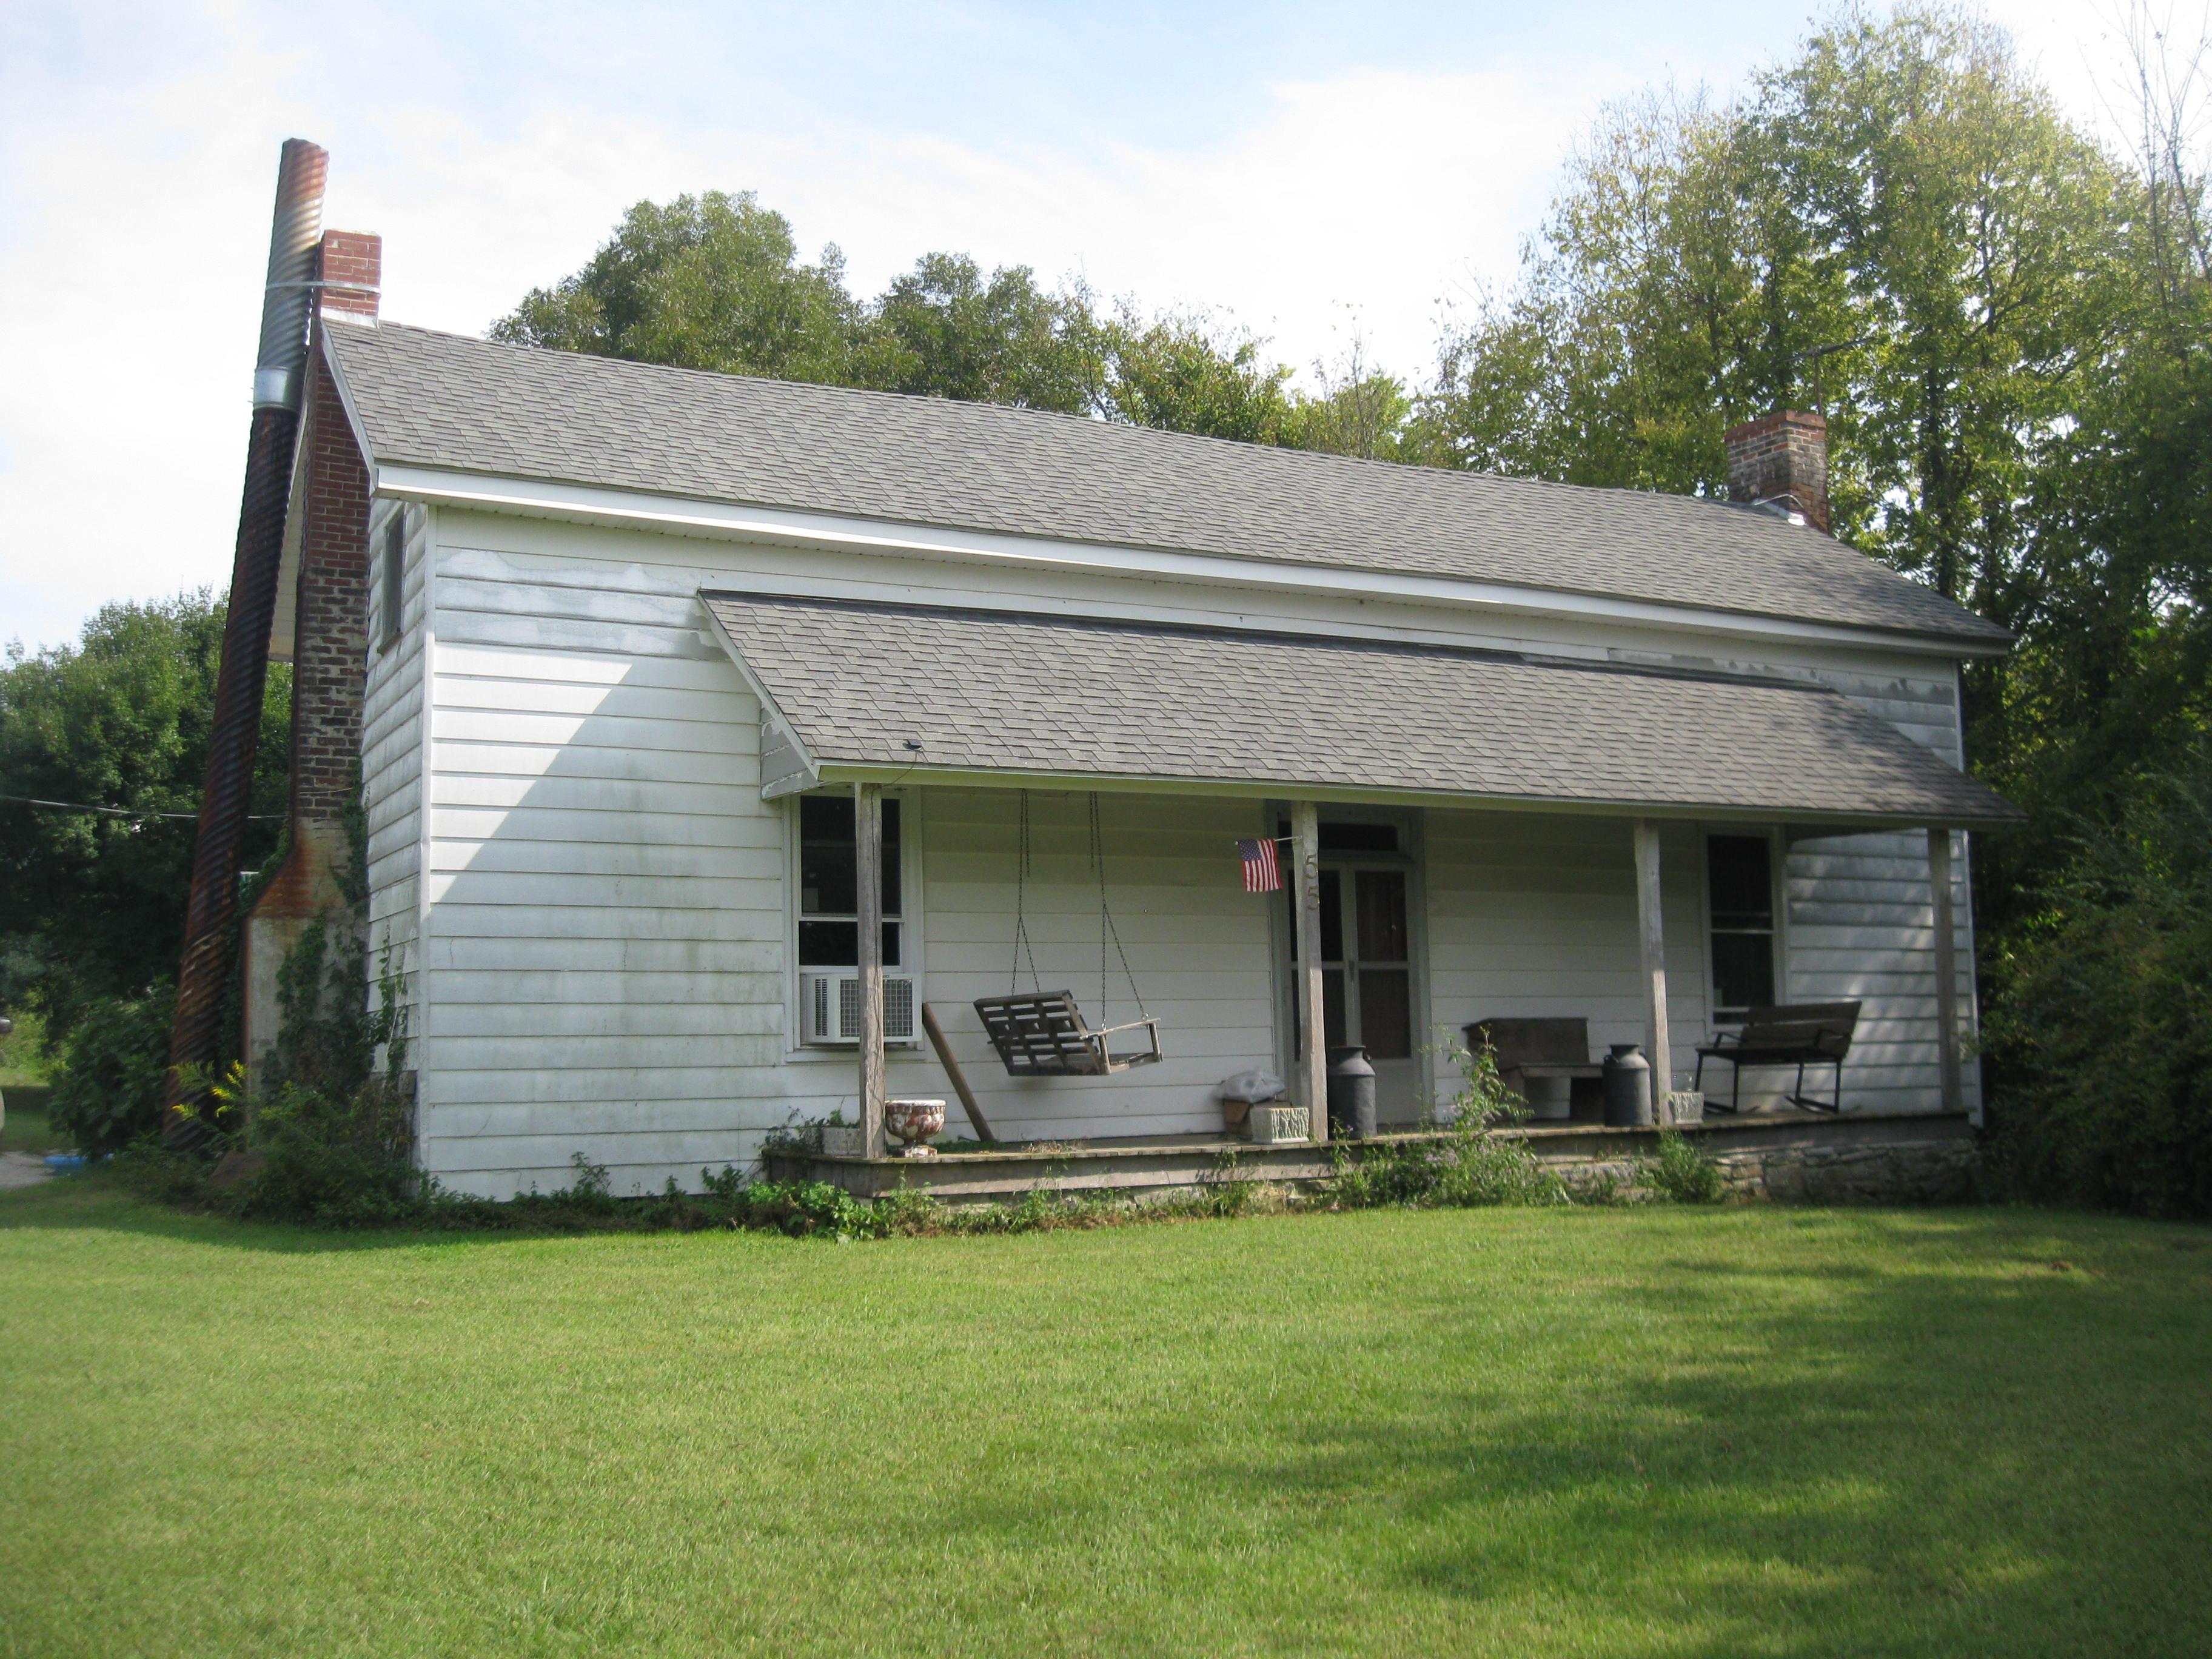 55 Mike Bryant Rd, Petersburg, Tennessee 37144